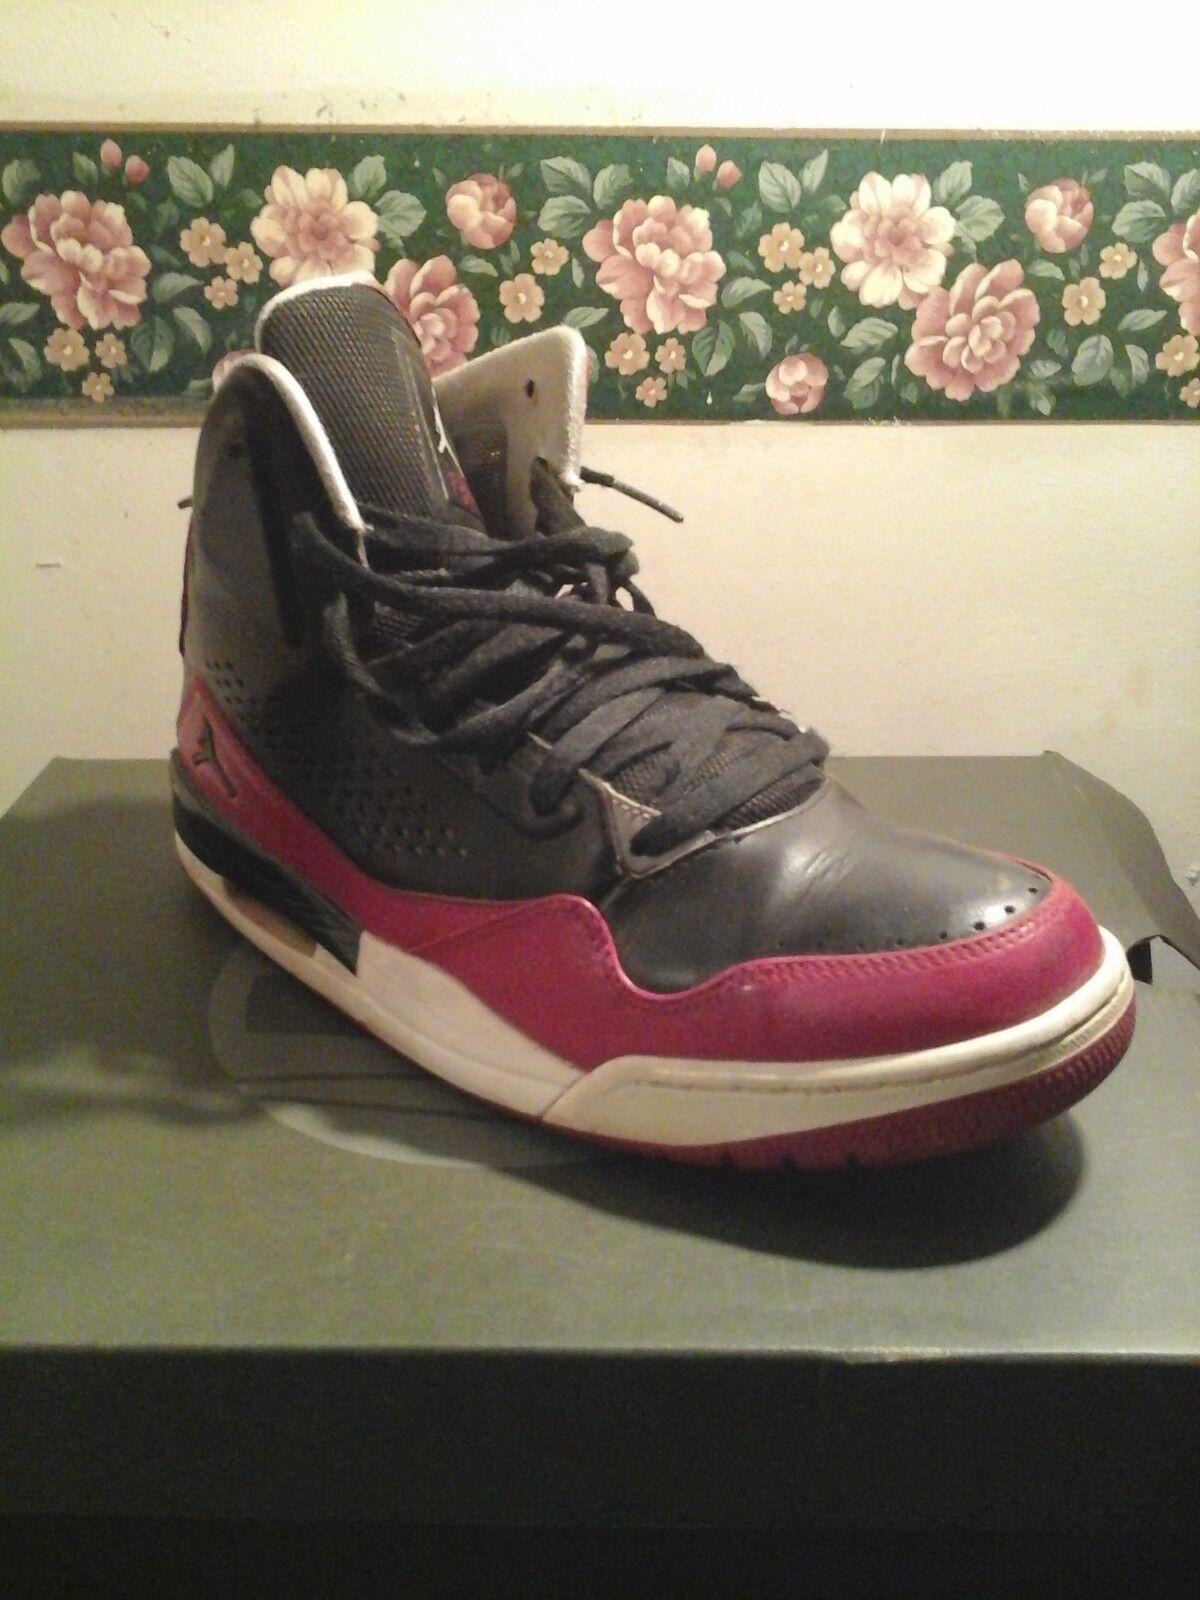 7ec9fcbd8135 Jordan Flight 3 3 3 Retro Shoes Nike size 9.5 red Black   White basketball  aaa07c